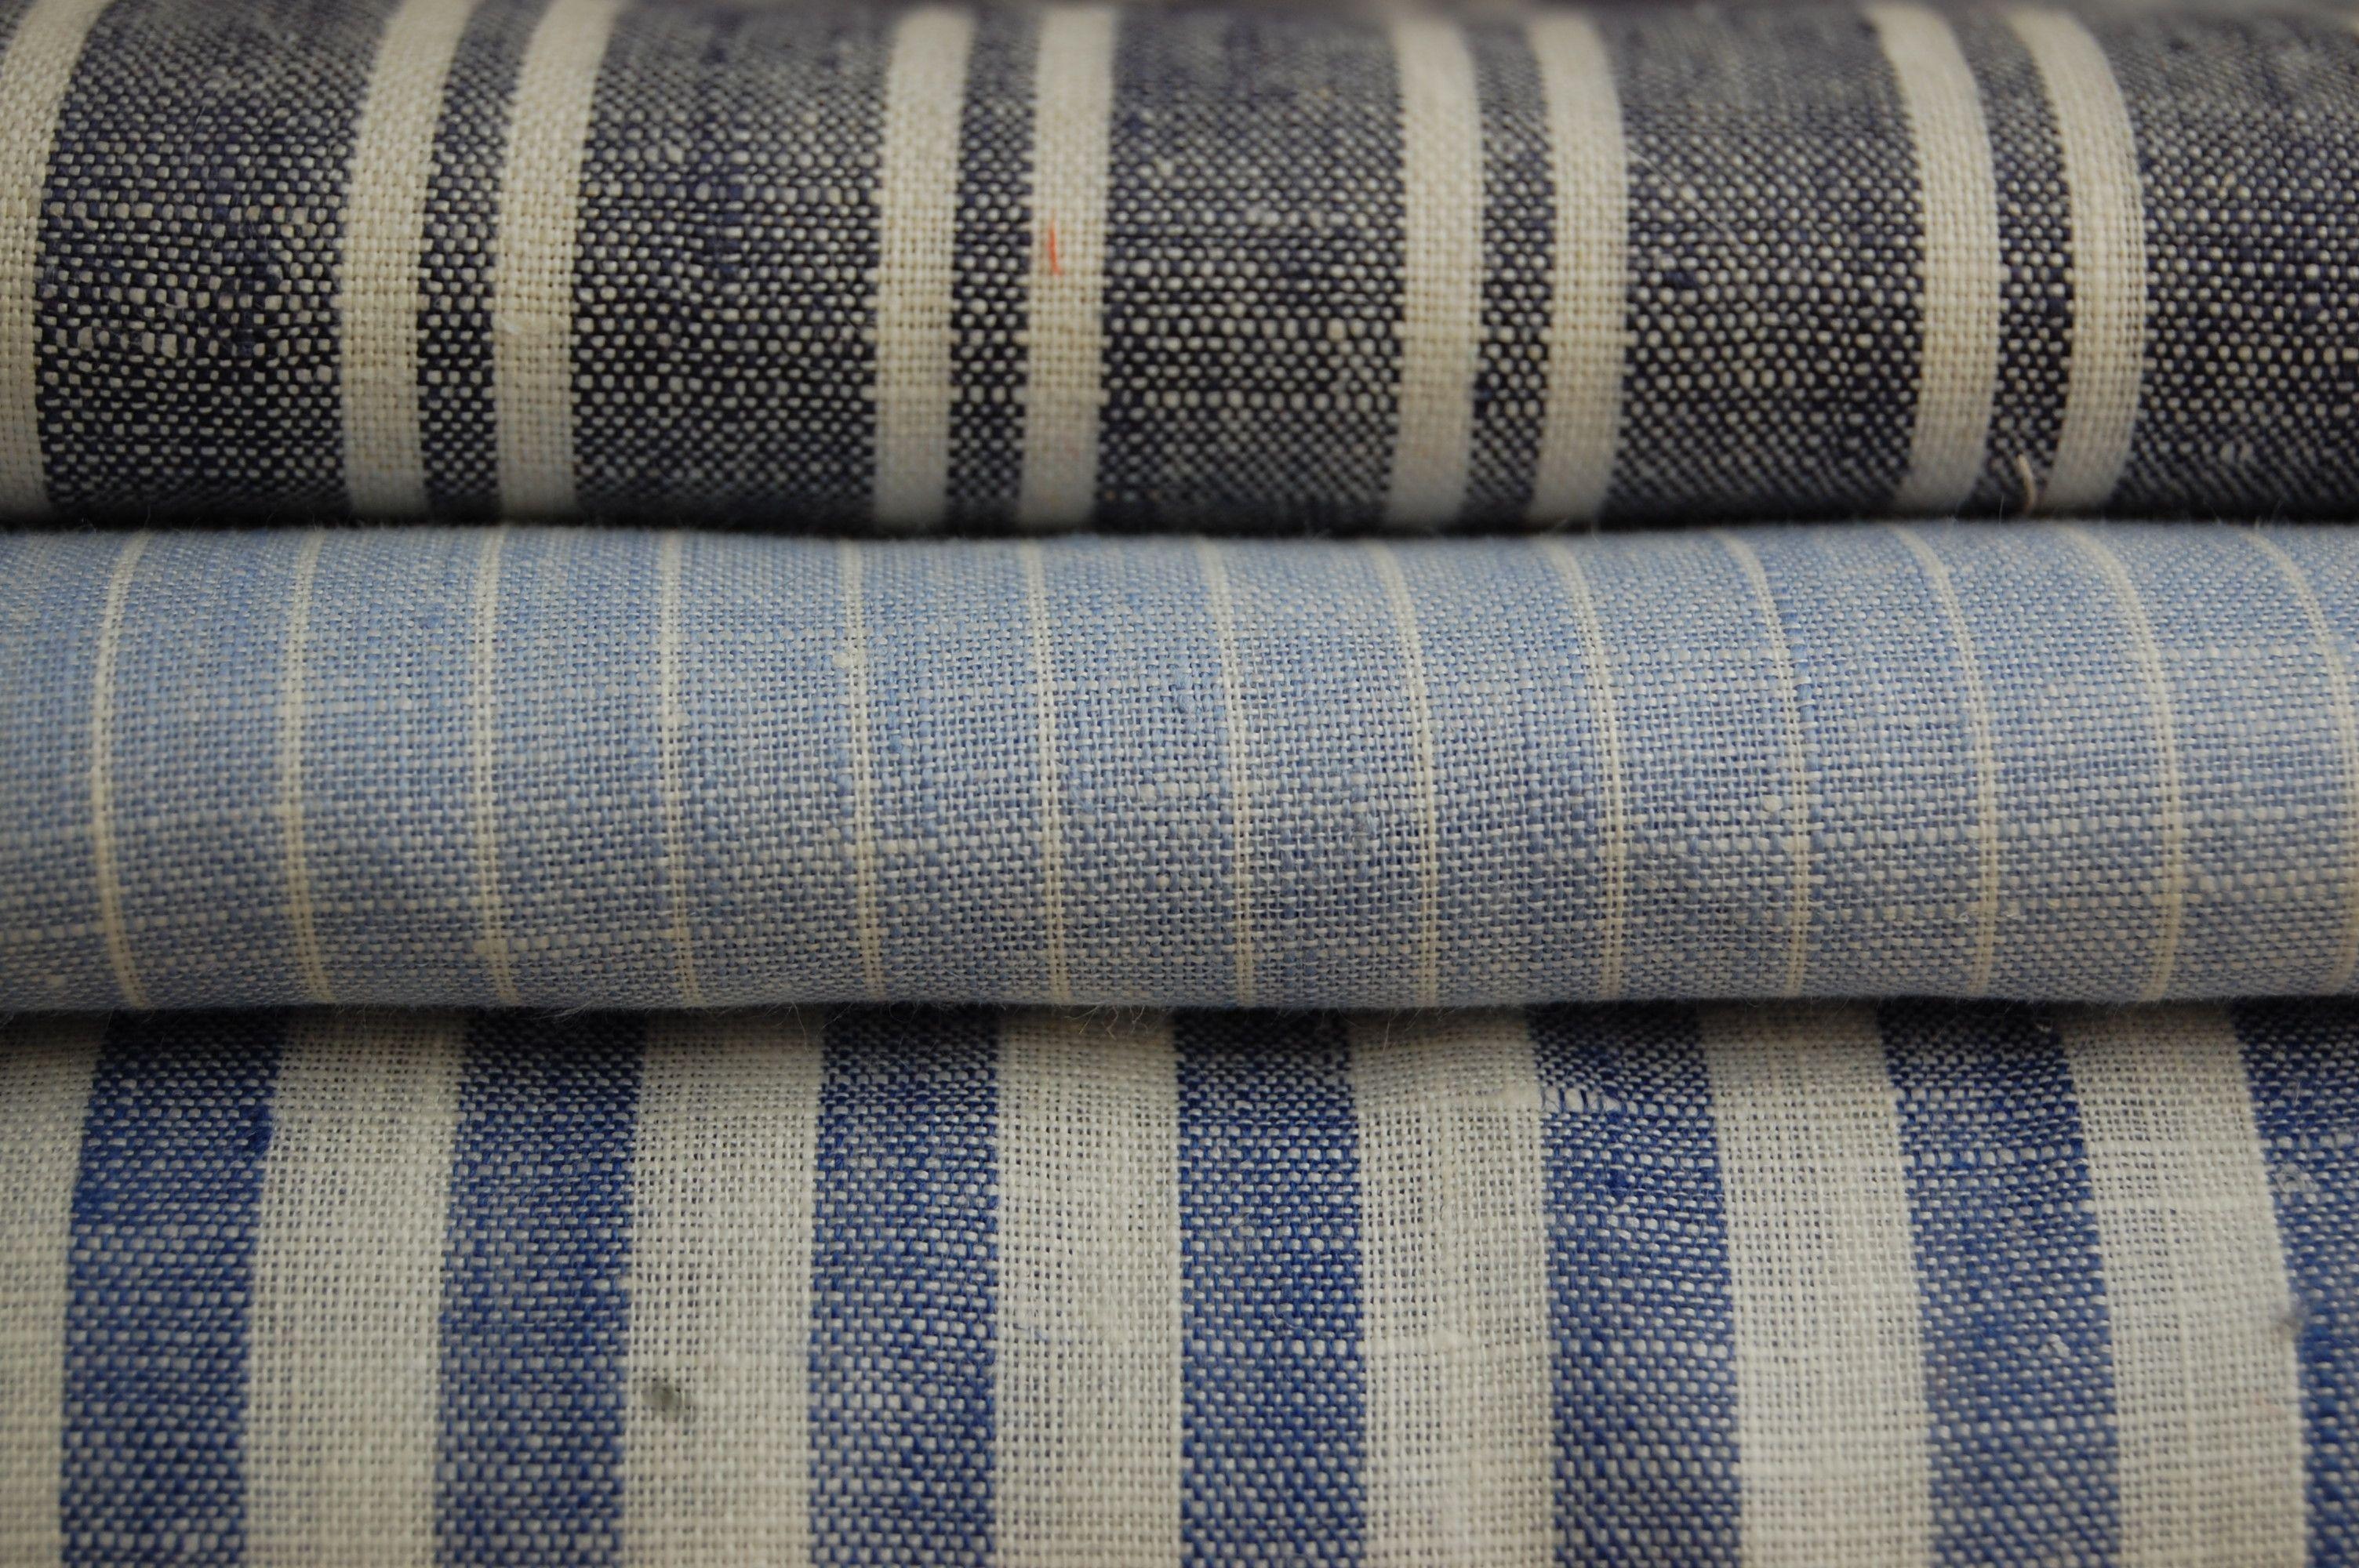 Pin By Adrialisa Ferranti On Moi Fotki Pretty Fabric Vintage Linens Fabric Design